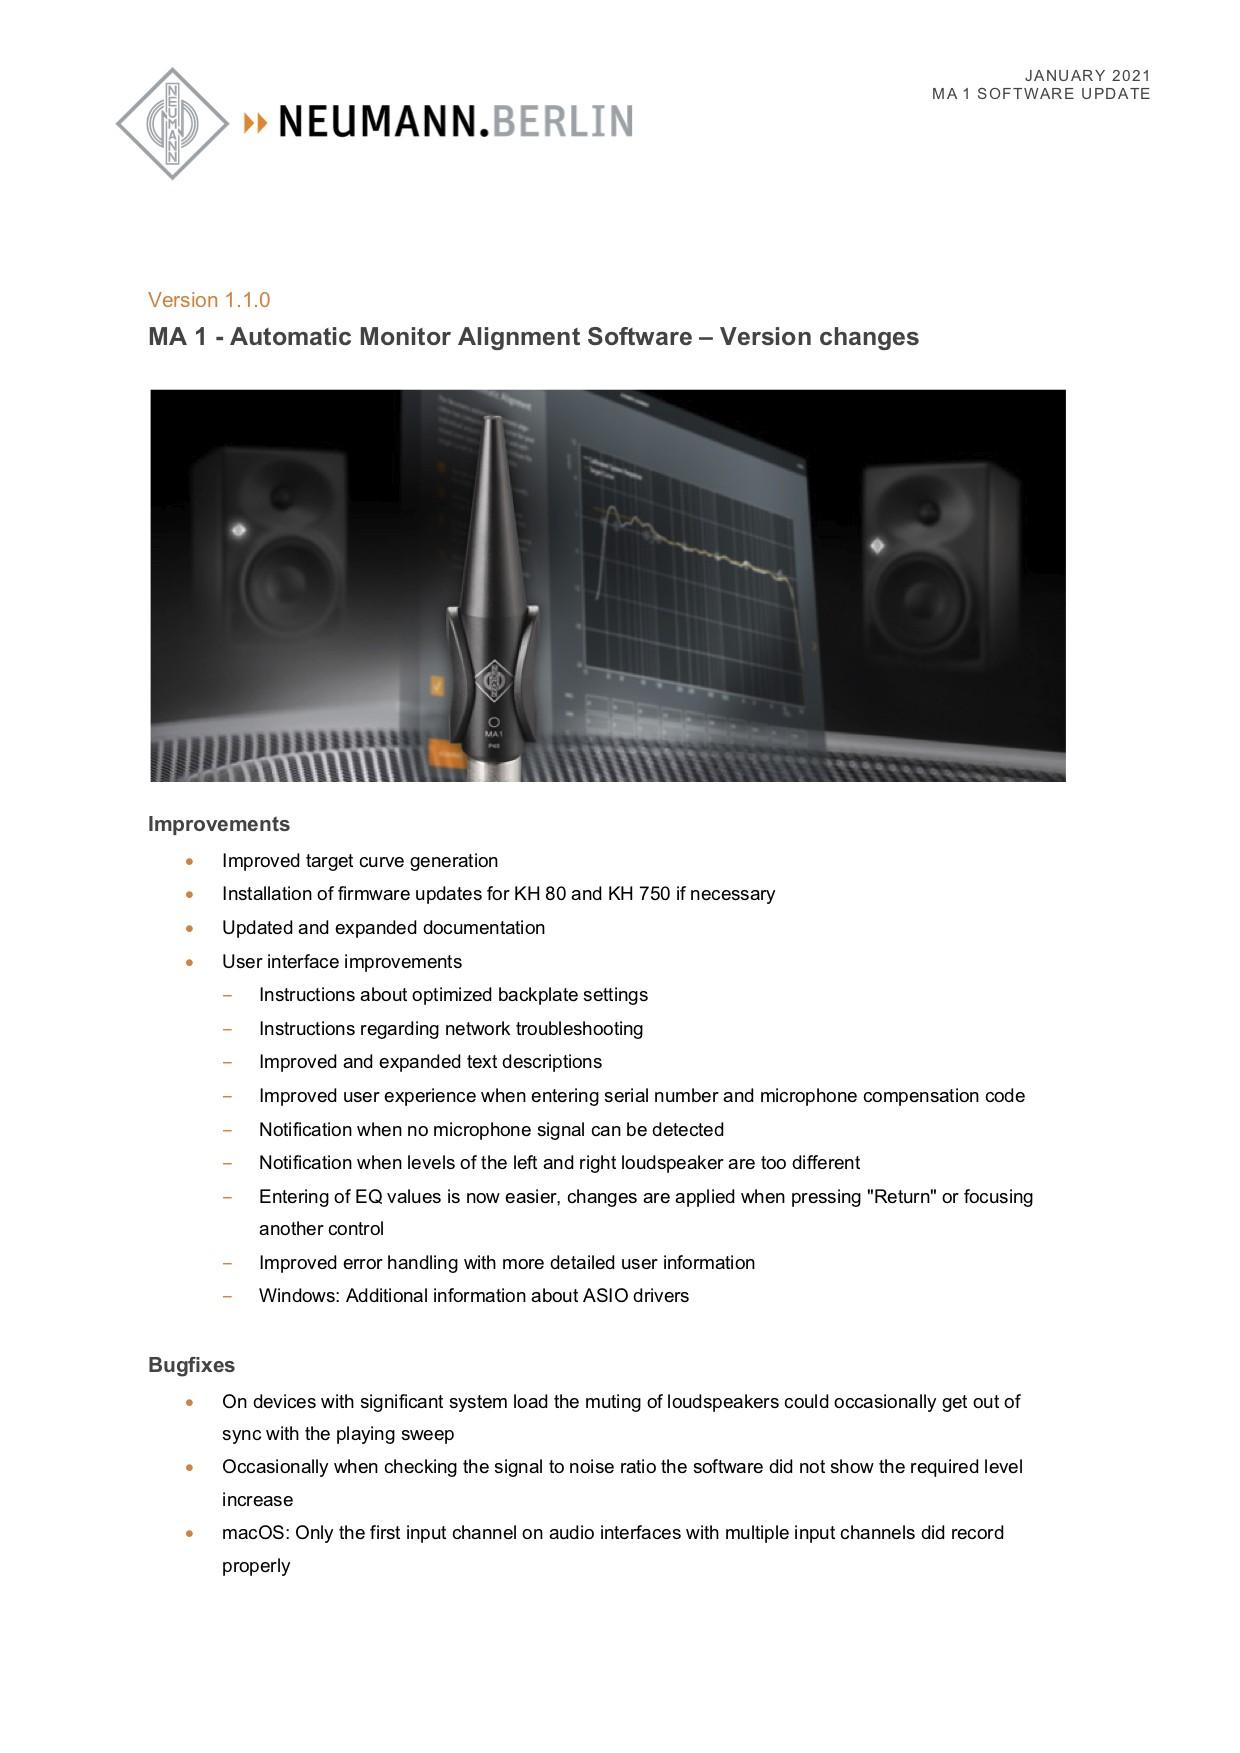 Neumann_MA1_Software_Version_History_2021-01_21.jpg